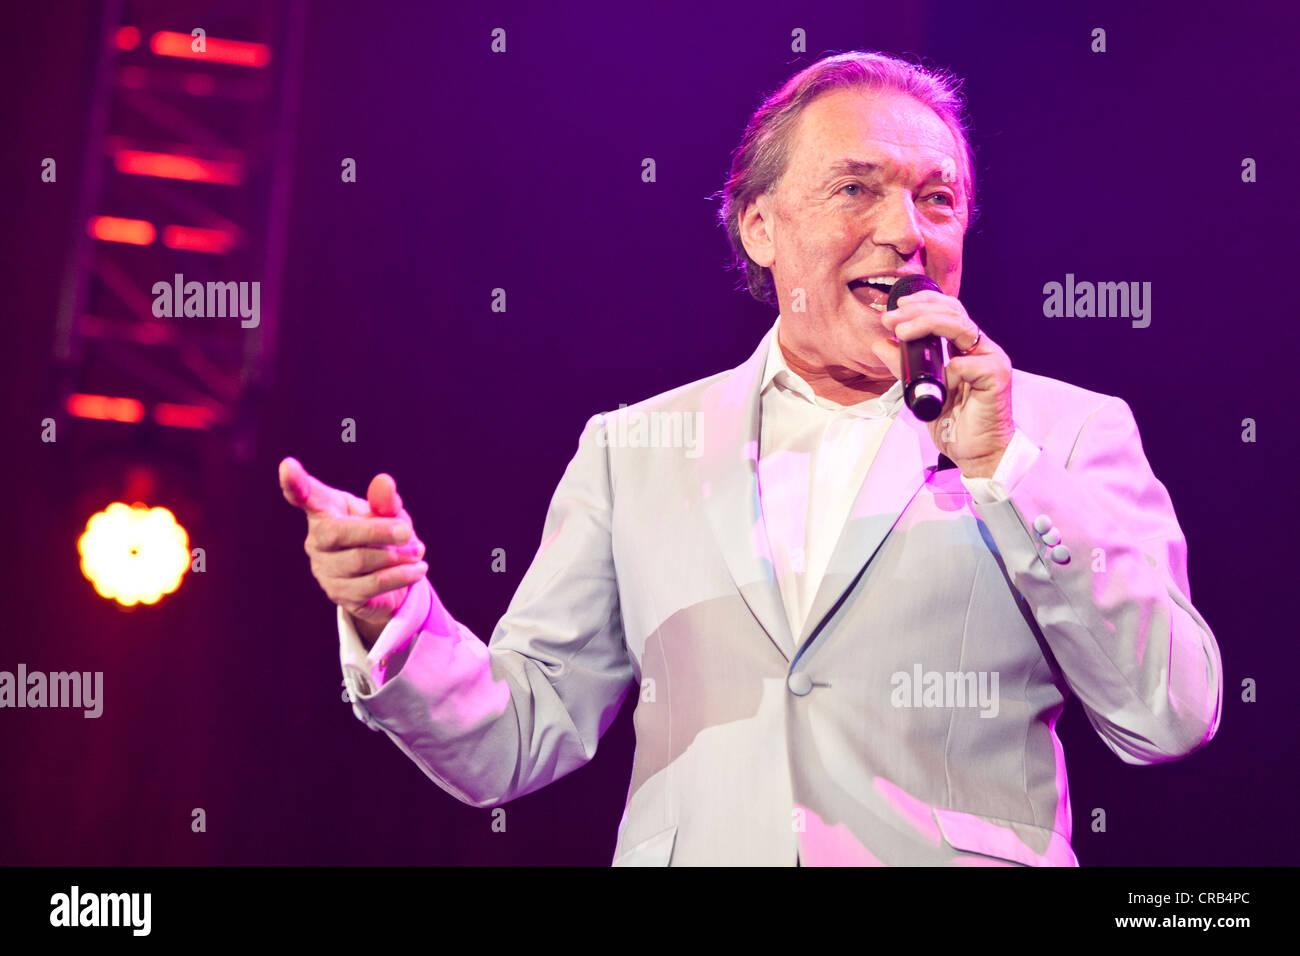 Czech pop singer Karel Gott performing live at the Schlager Nacht 2012, pop song night, in Lucerne, Switzerland, - Stock Image